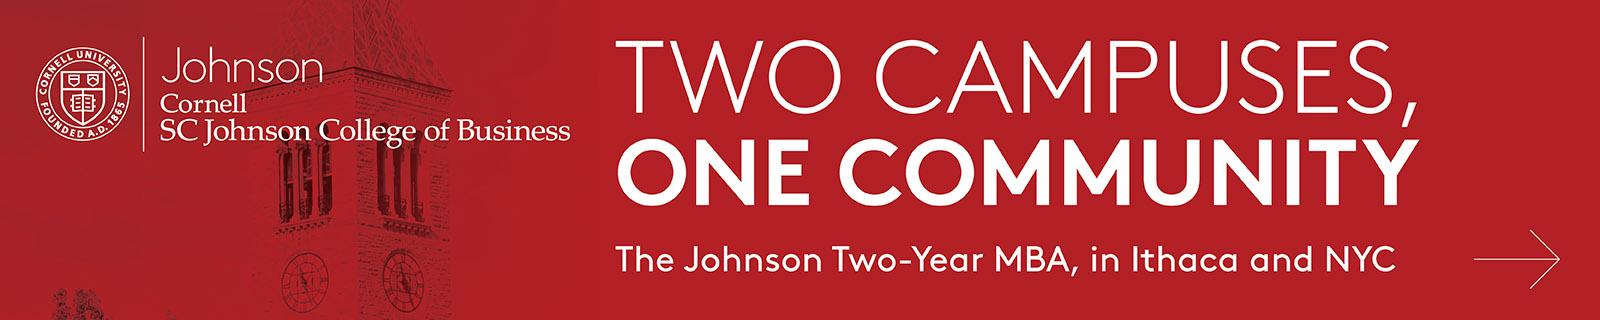 Banner of Cornell University: Johnson Two-Year MBA